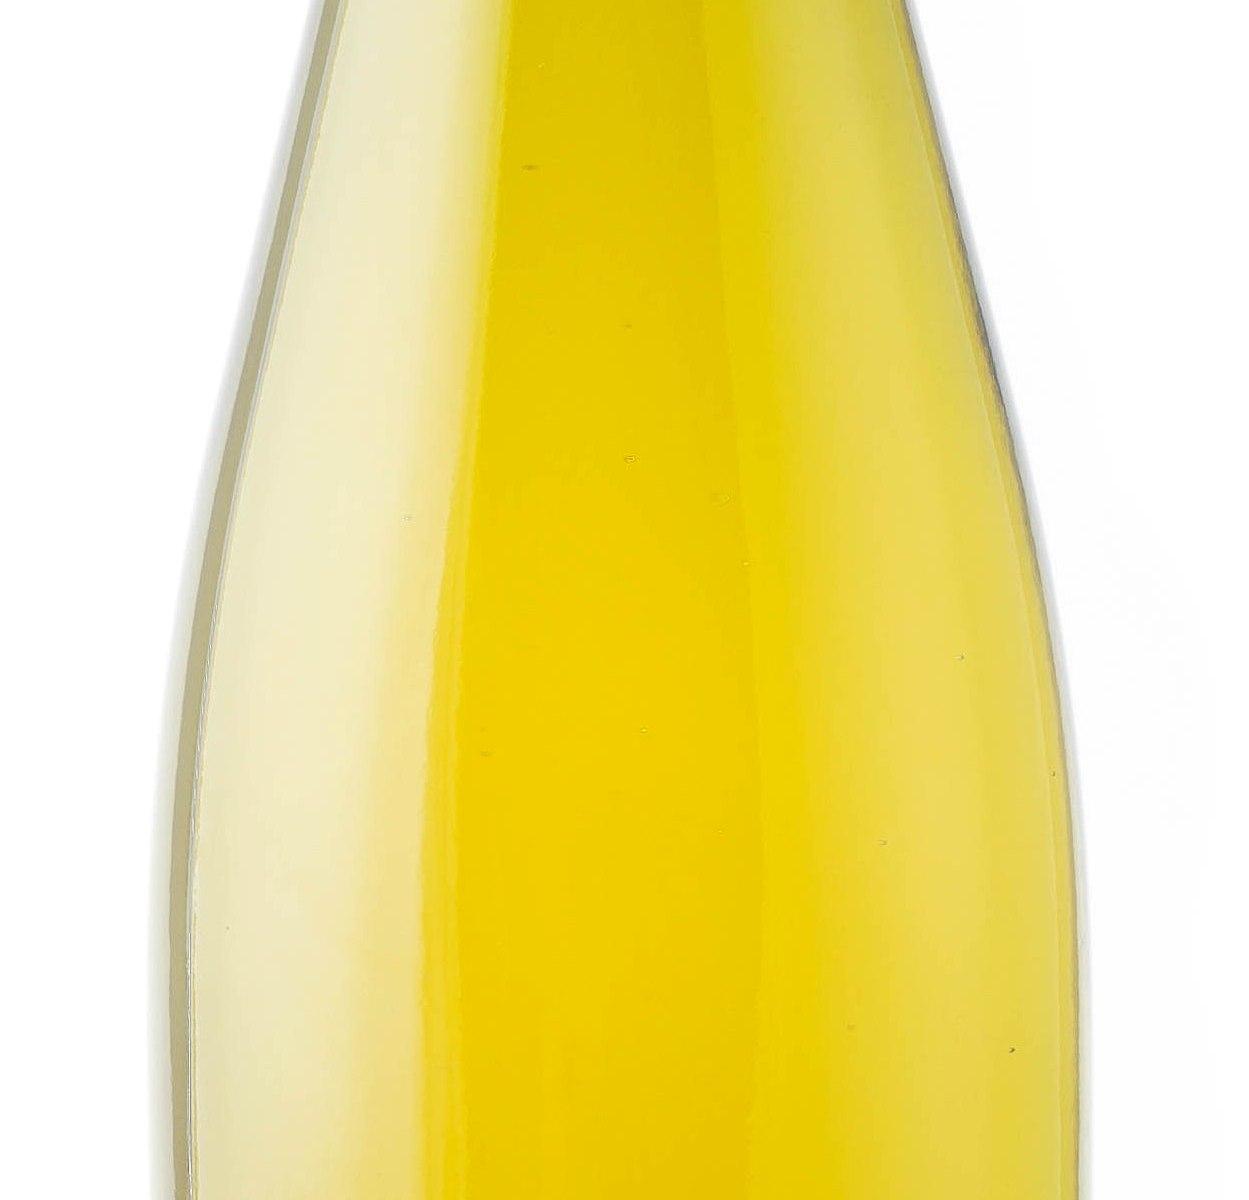 Salwey Pinot Gris wine